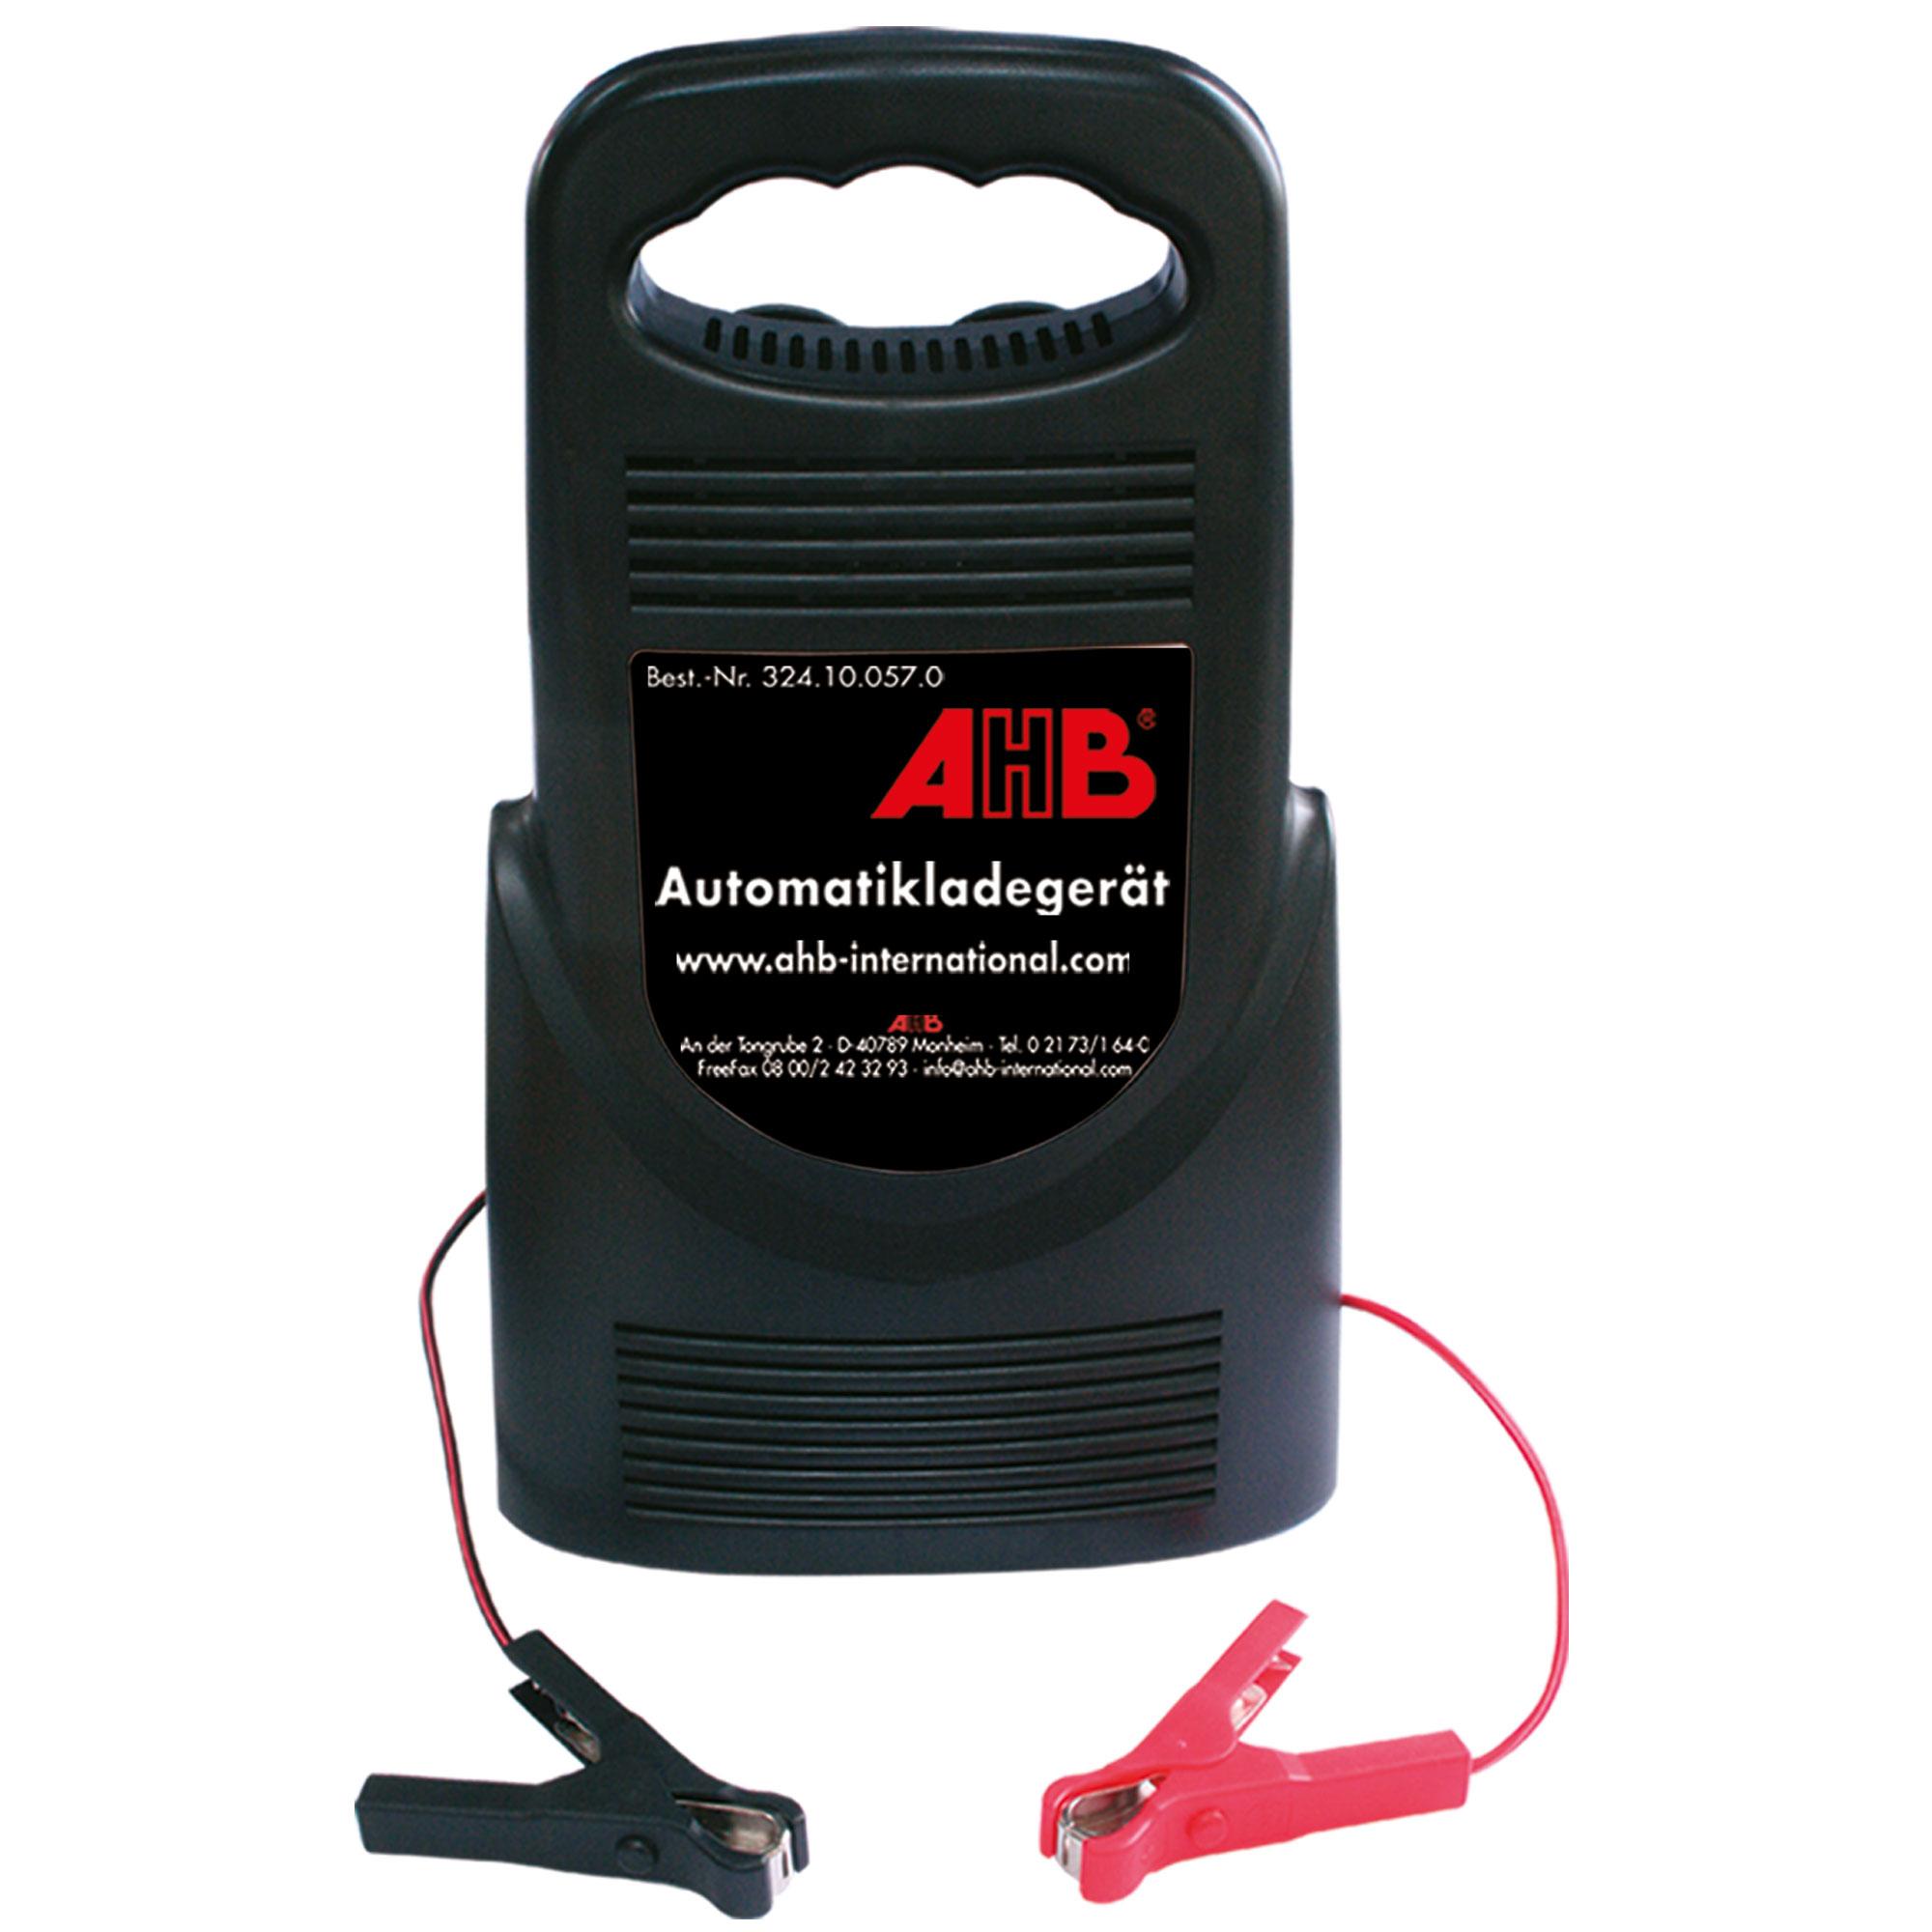 Automatikladegerät 12 V mit 4A Ladestrom